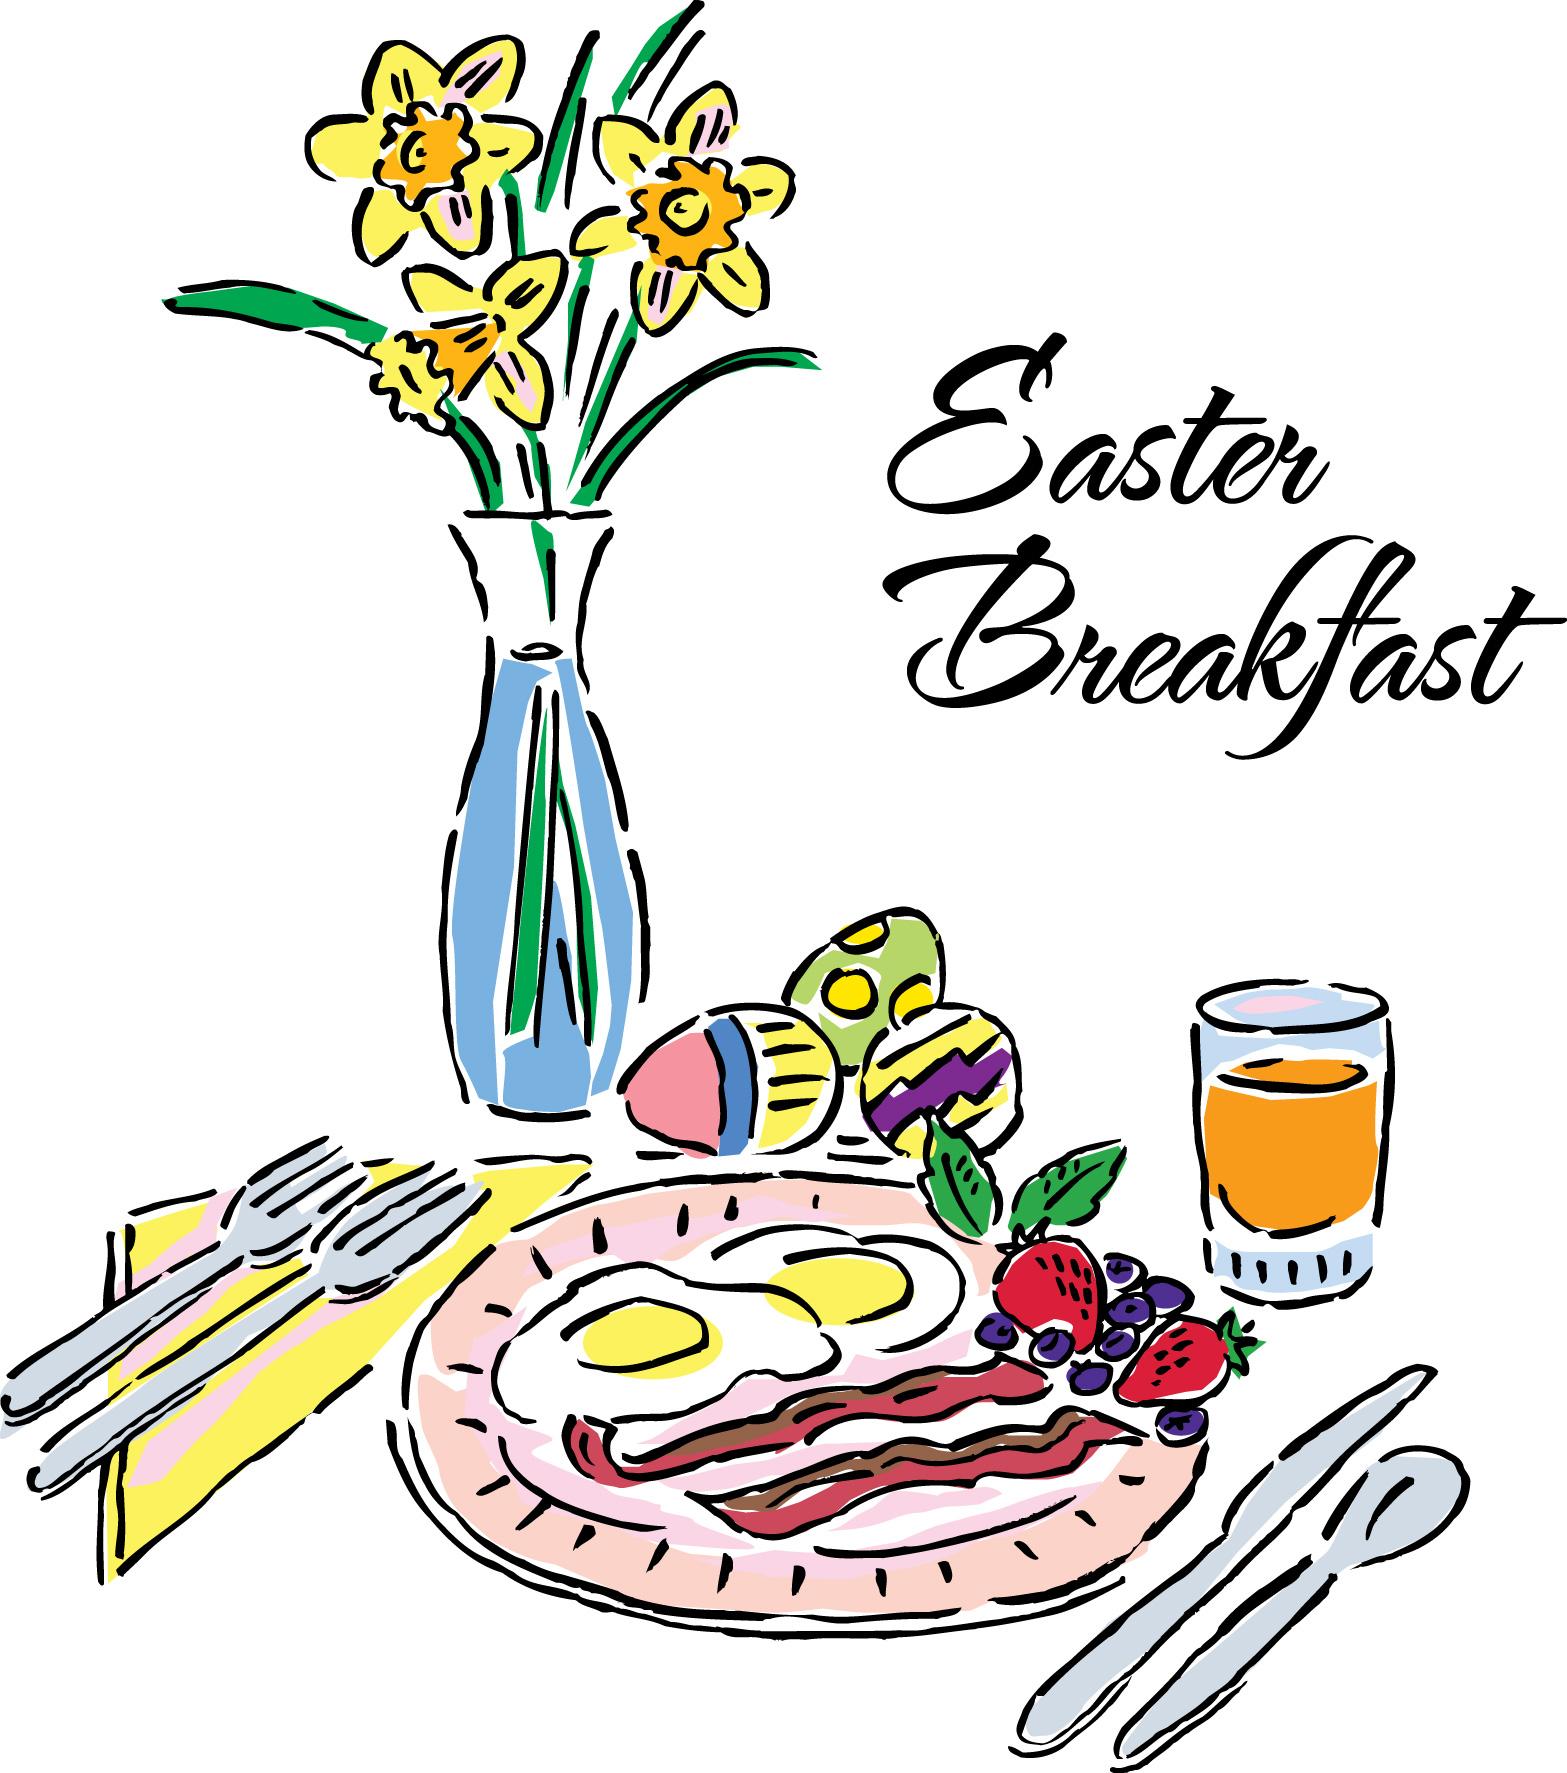 Breakfast clipart easter morning Clipart Clipart ClipartFan Easter com